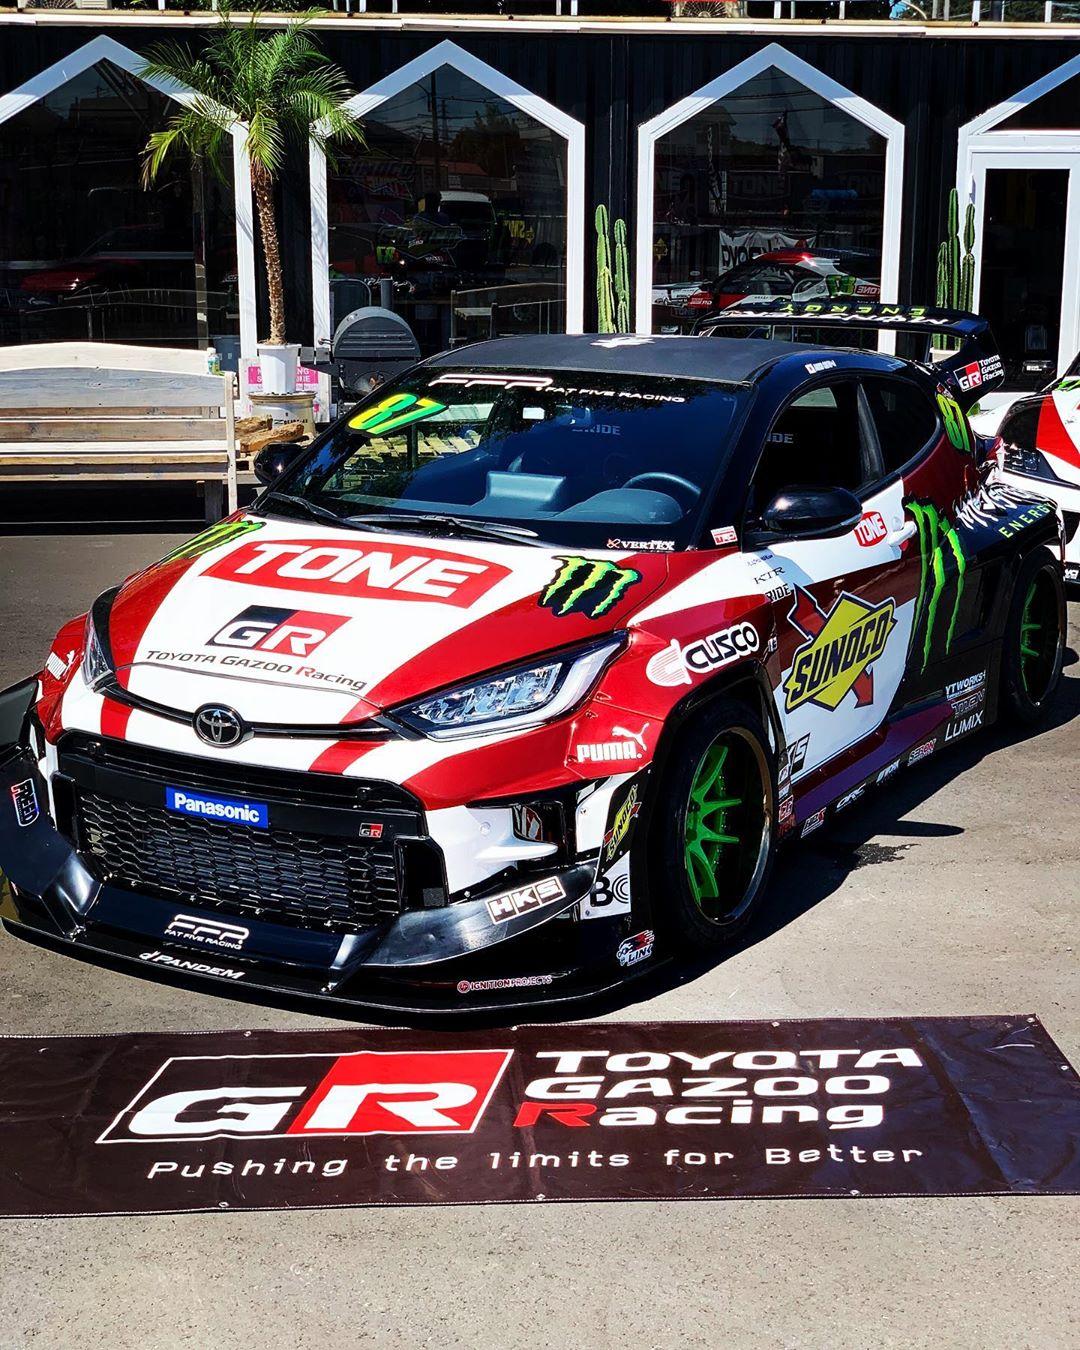 Toyota-GR-Yaris-Daigo-Daito-with-2JZ-engine-5